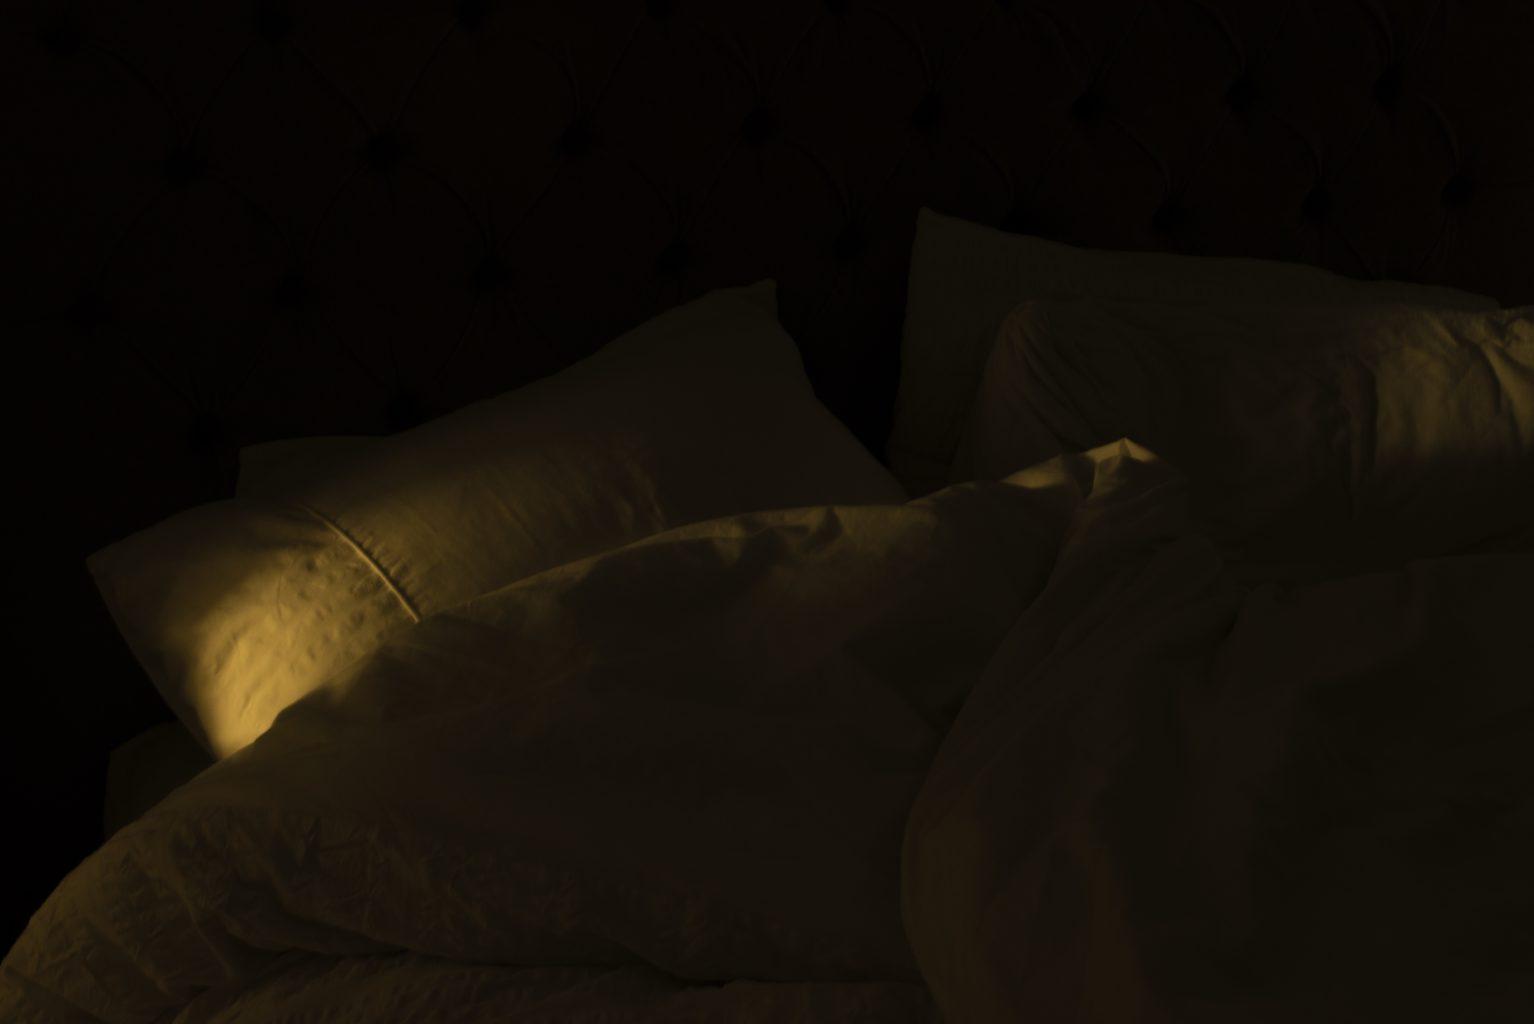 Week 7: <em>Bedroom</em>, 'ביקורו של מוישה' (Moishe's visit) , Louise Fago-Ruskin, May 24, 2020